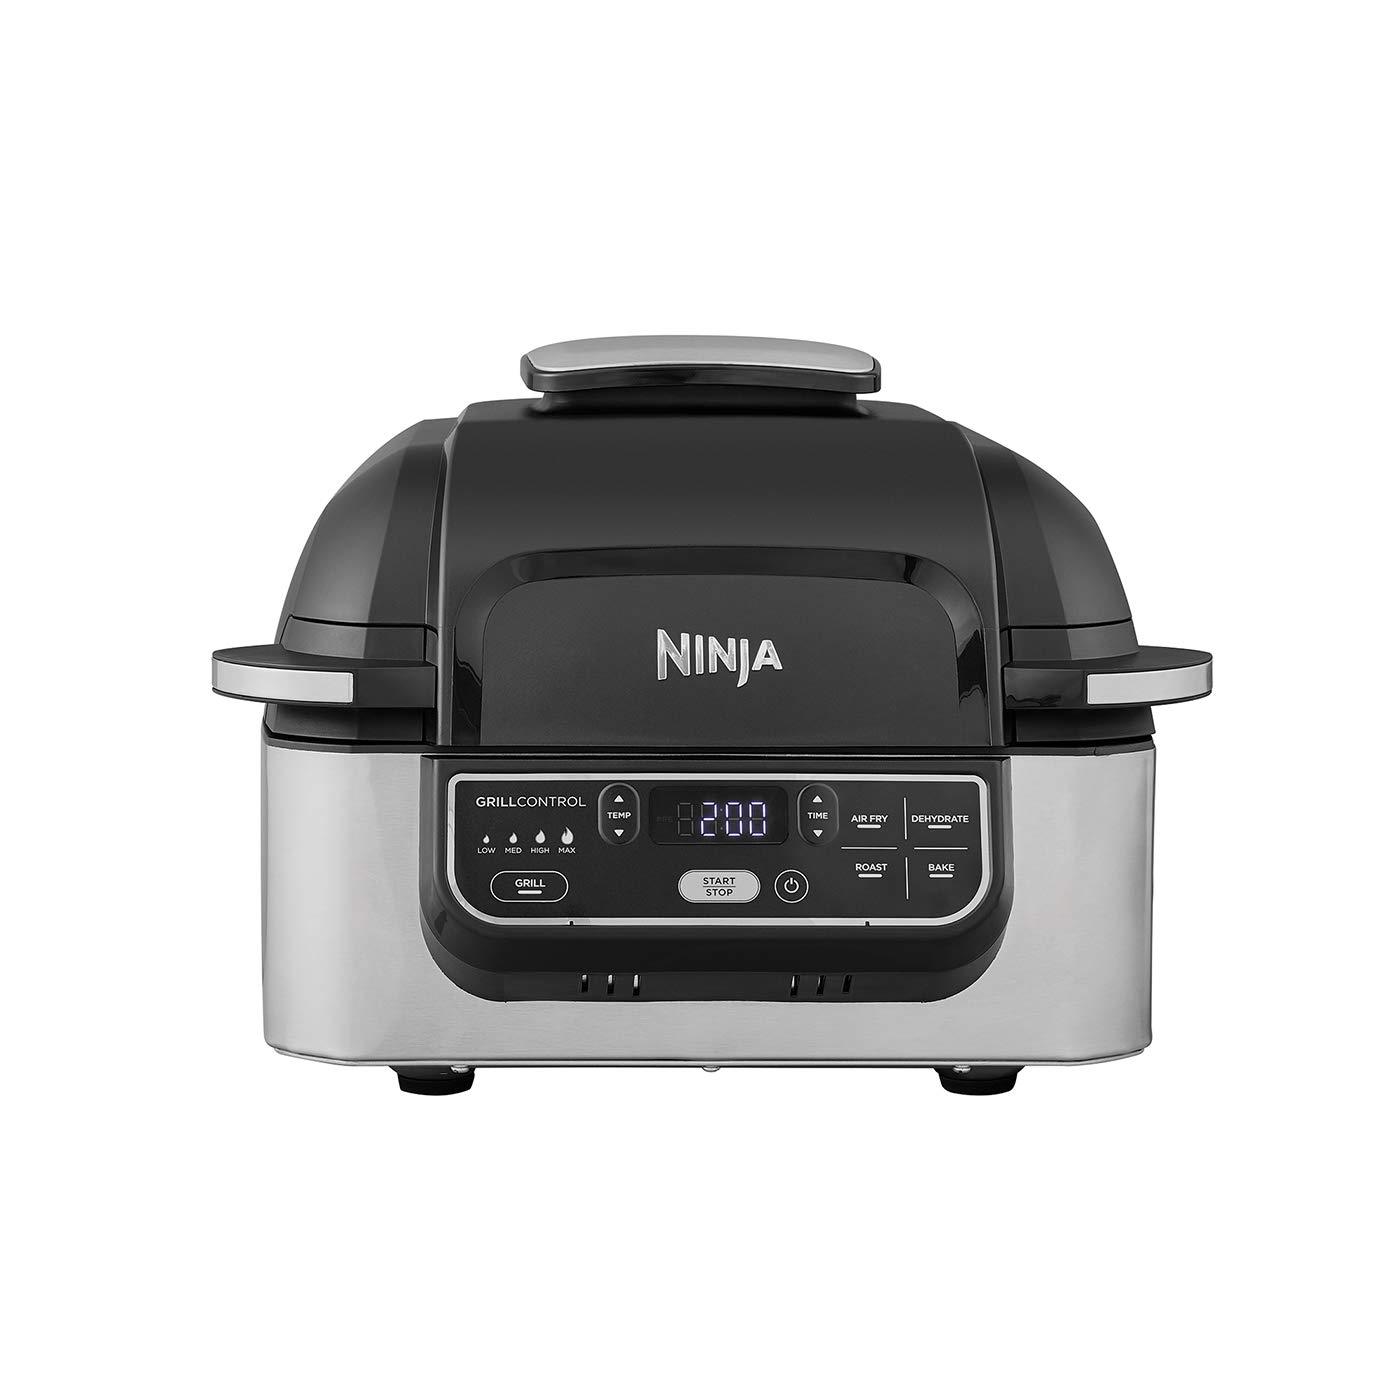 Ninja AG301UK Air Grill, Black £149.99 @ Amazon